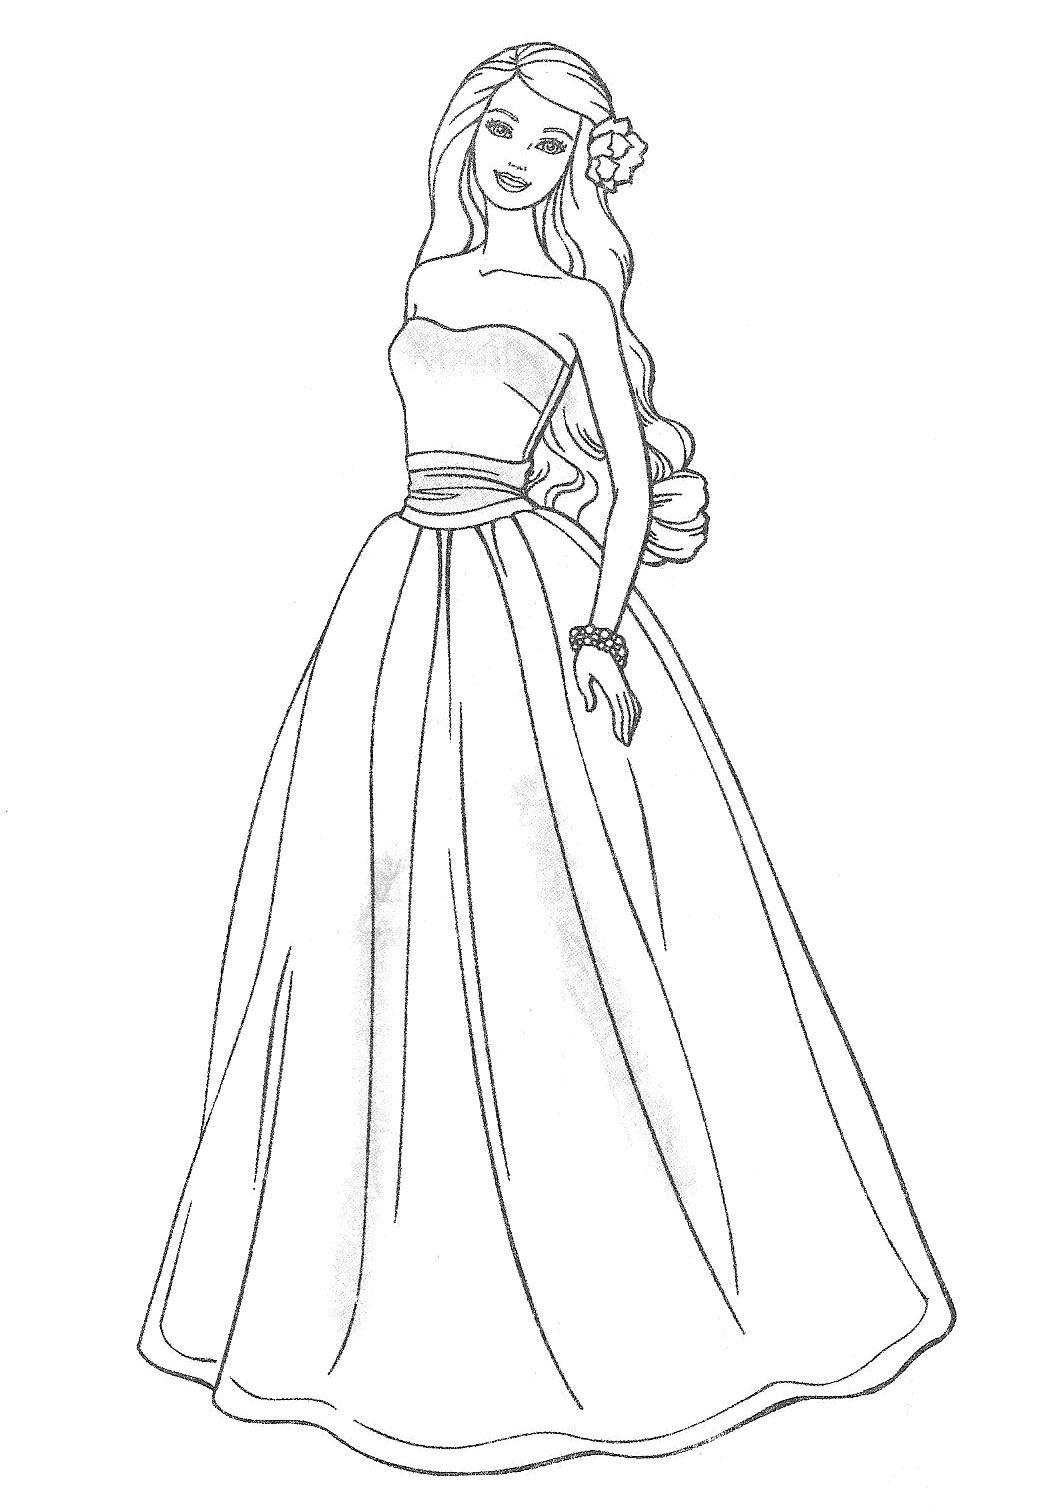 Topmodel Ausmalbilder Ohne Kleidung : Barbie Mermaidia Coloring Pages Coloring 3 Pinterest